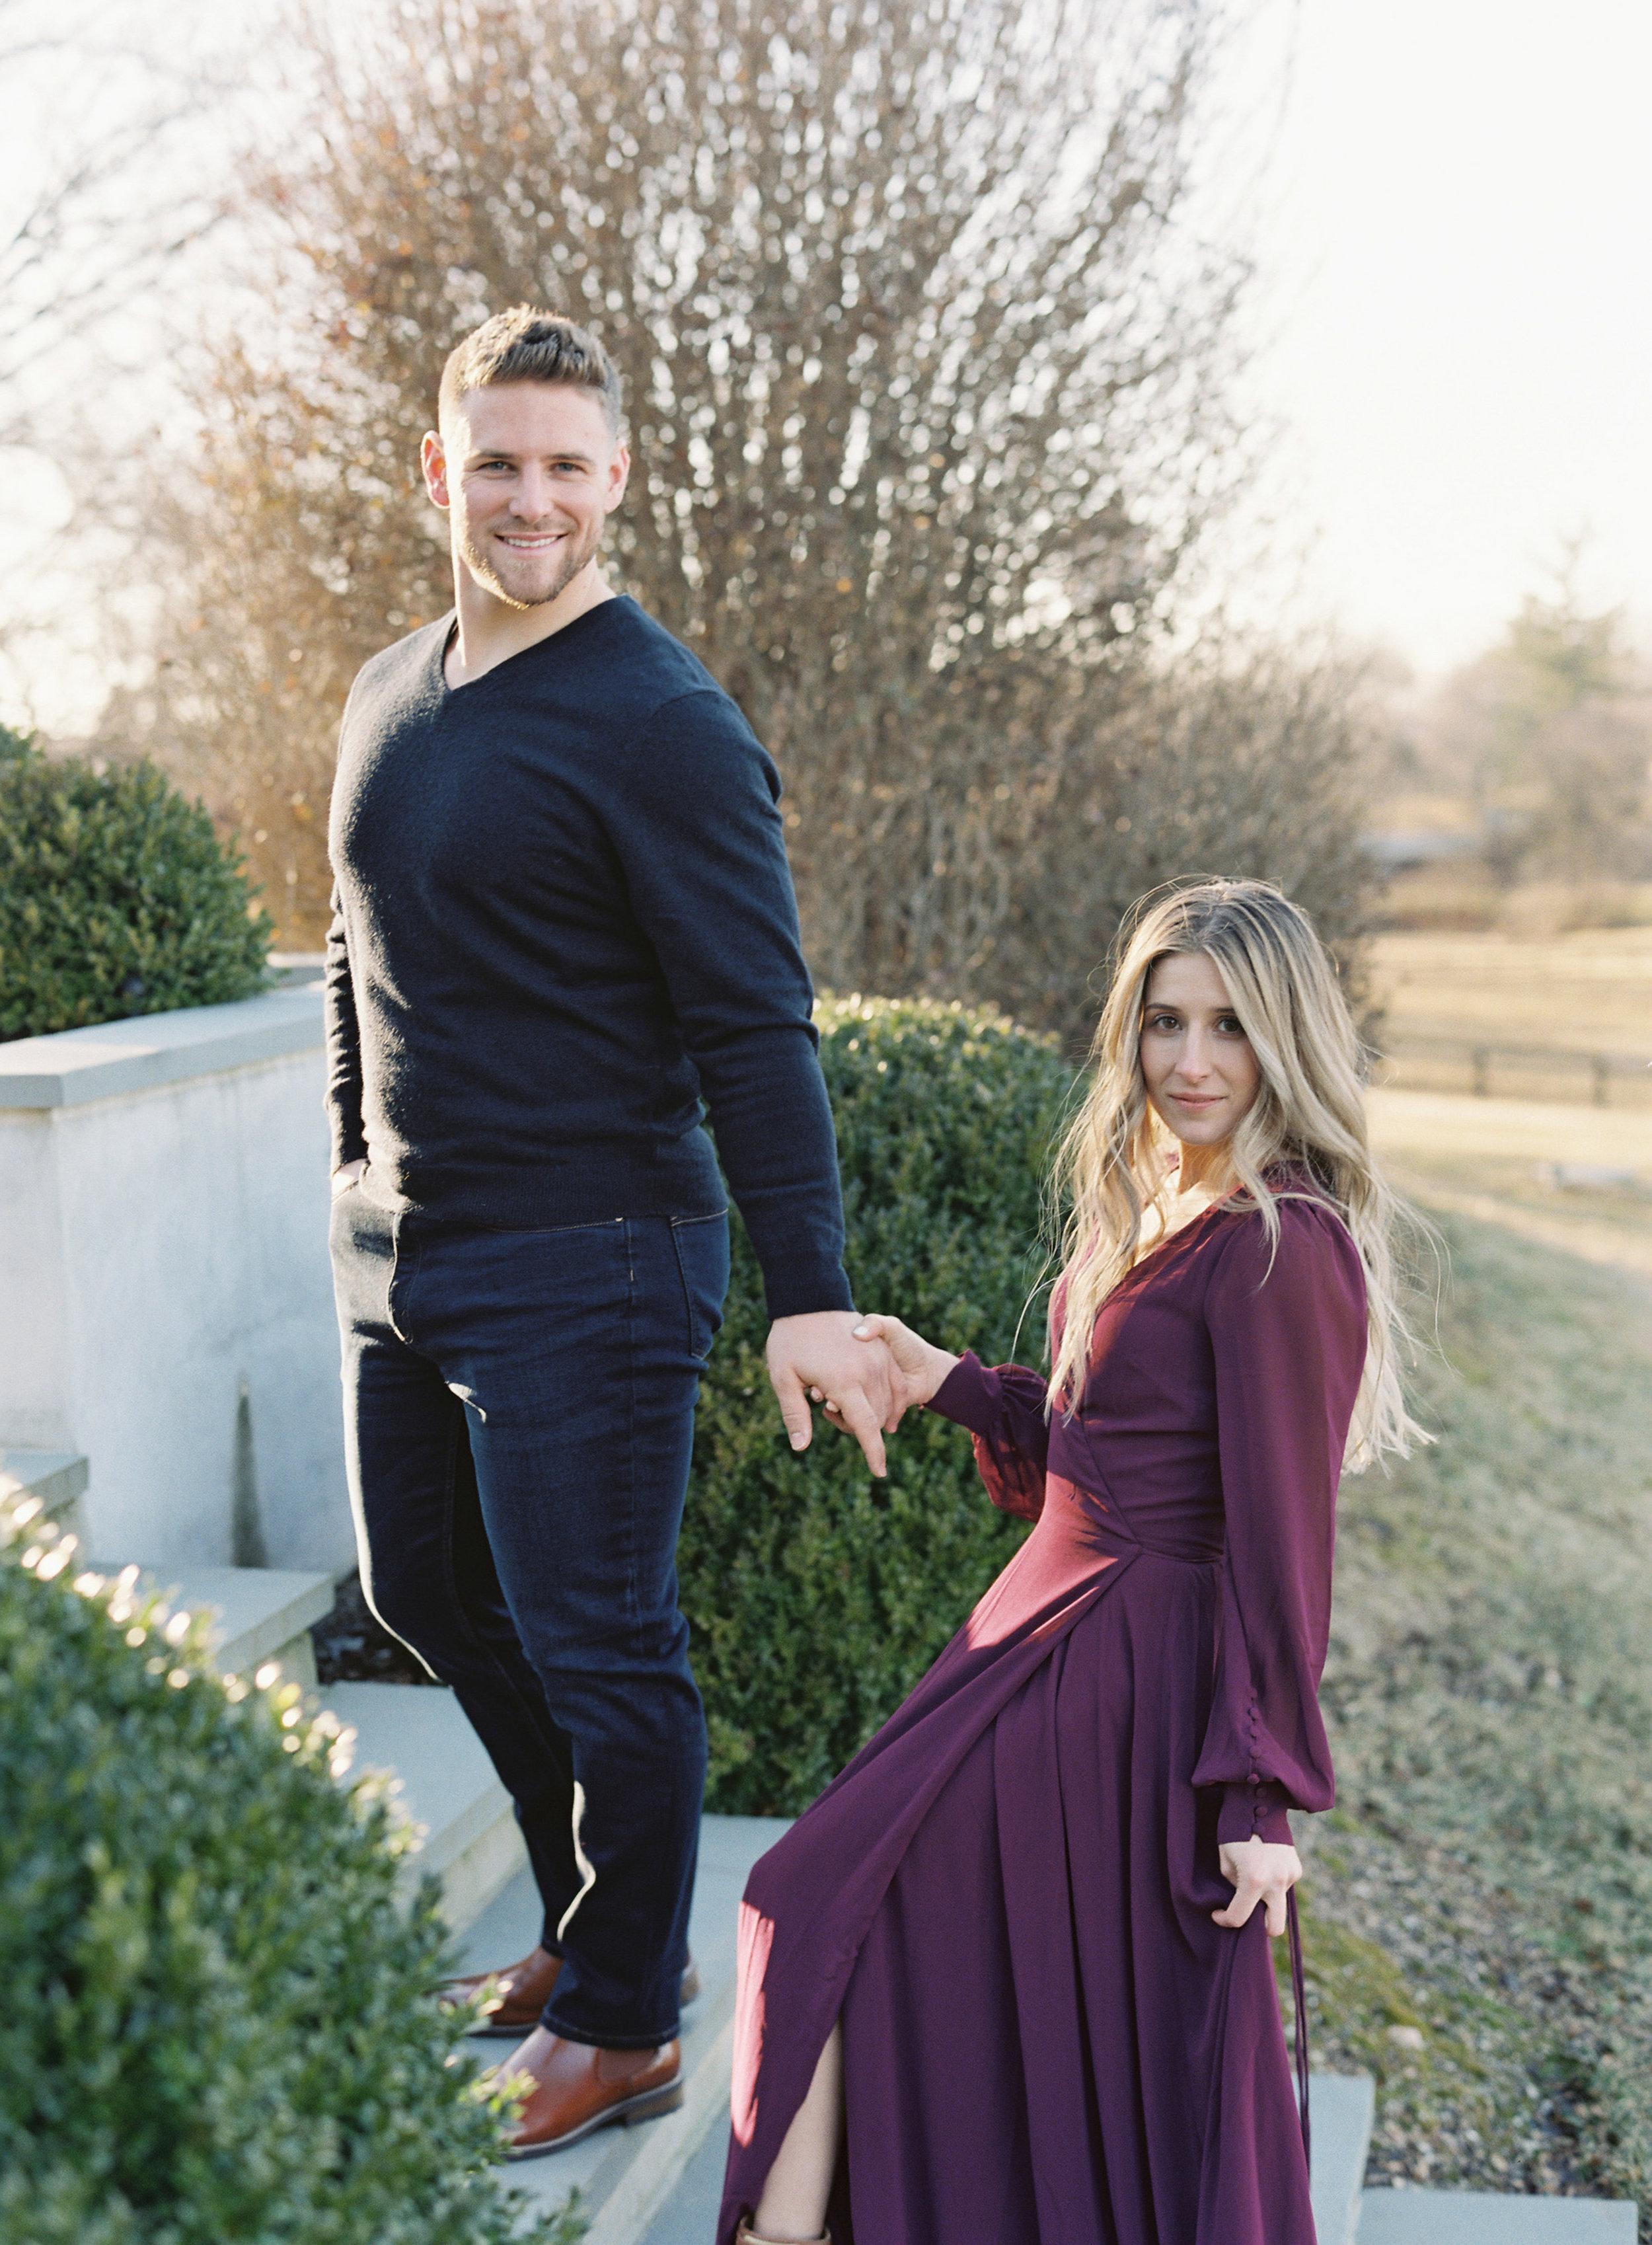 Mike & Kirsten February 2019 Engagement-0016.jpg